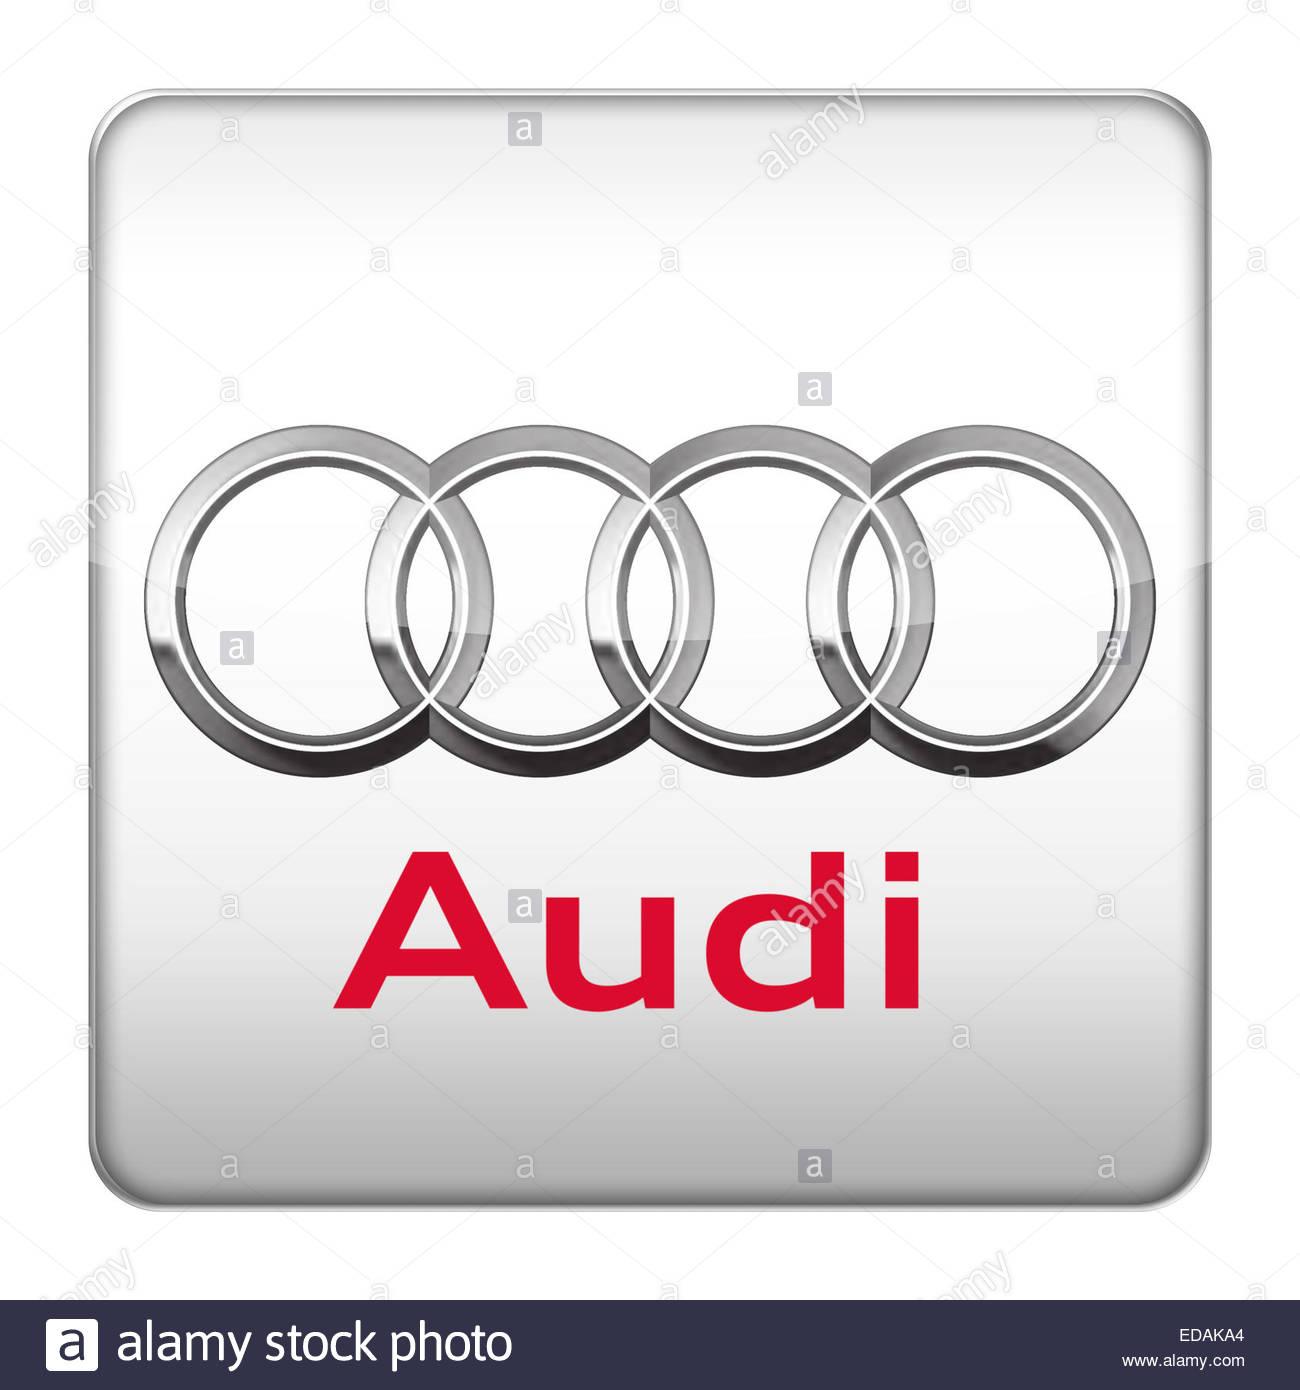 Audi logo icon Stock Photo, Royalty Free Image: 77066700 - Alamy